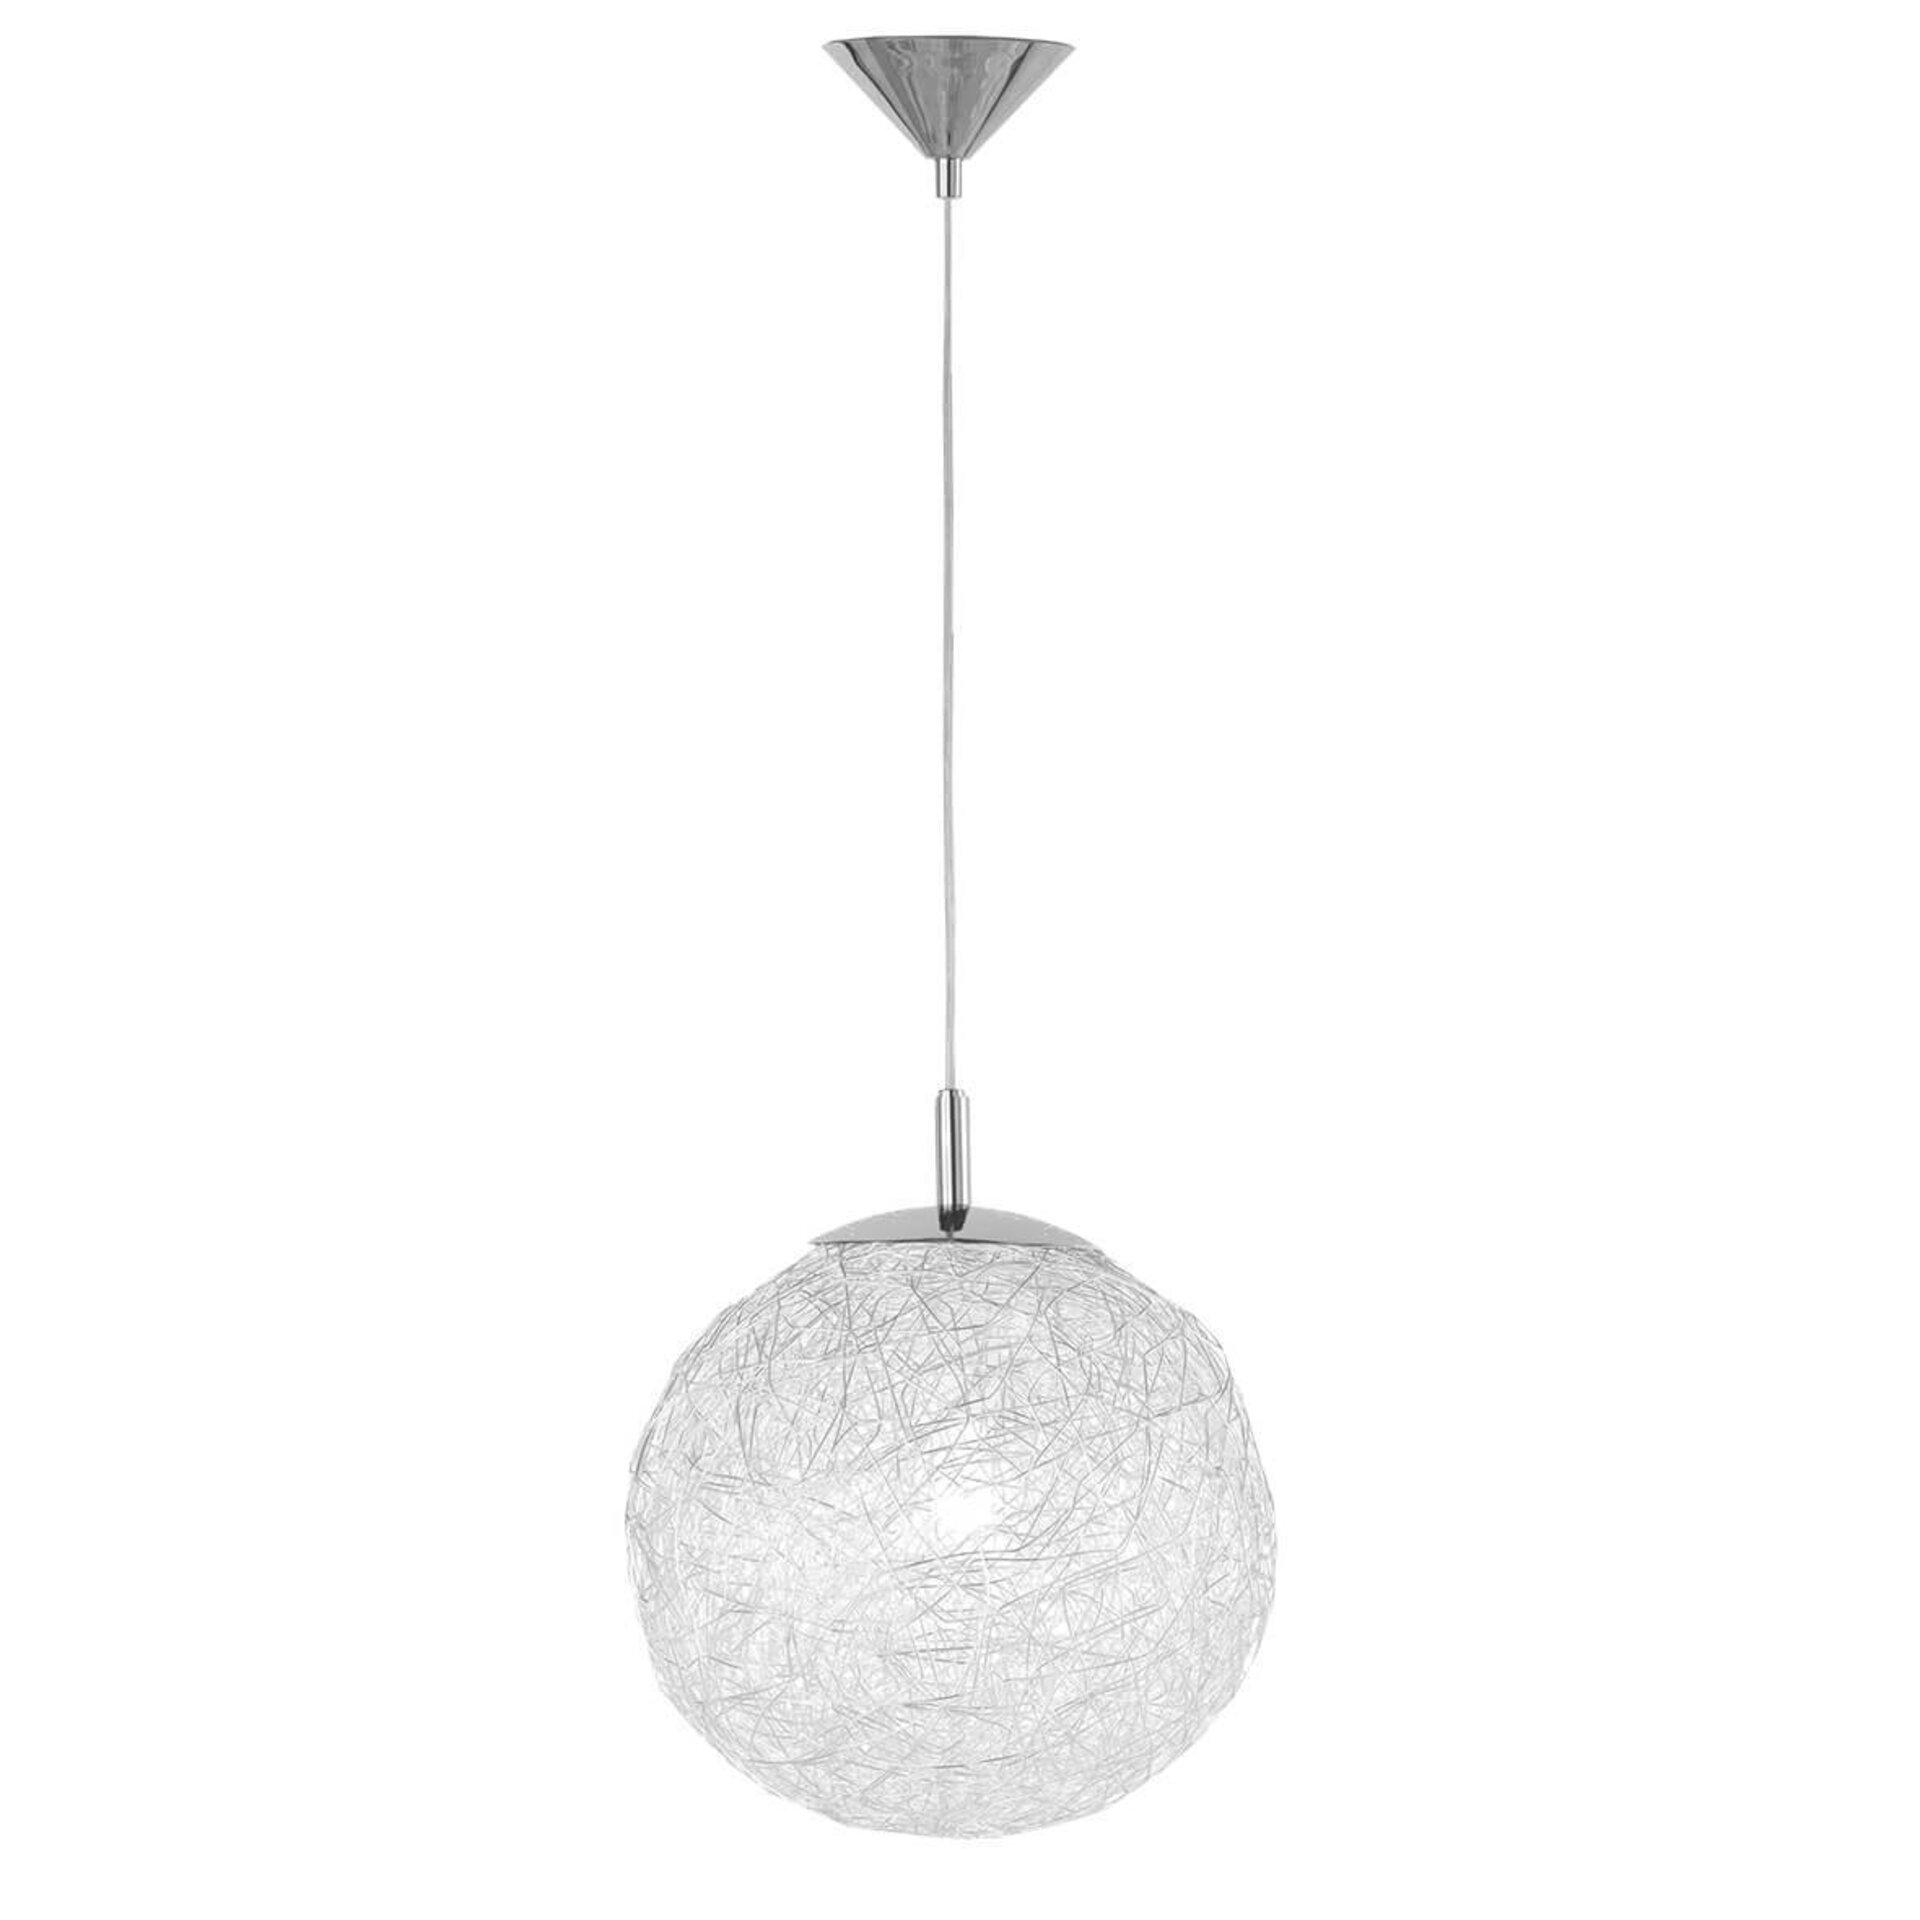 Pendelleuchte Dakota Wofi Leuchten Metall silber 30 x 150 x 30 cm